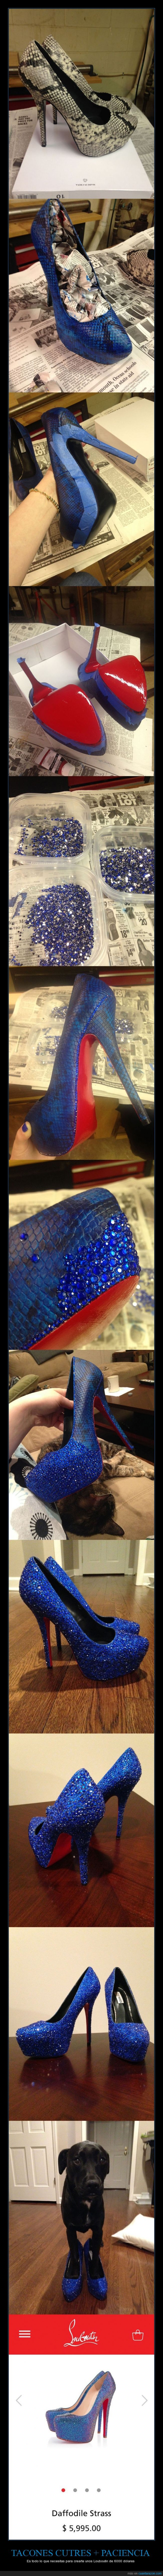 apaño,azul,crear,imitación,louboutin,paciencia,pedreria,pegar,pintar,roja,serpiente,suela,tazones,zapatos